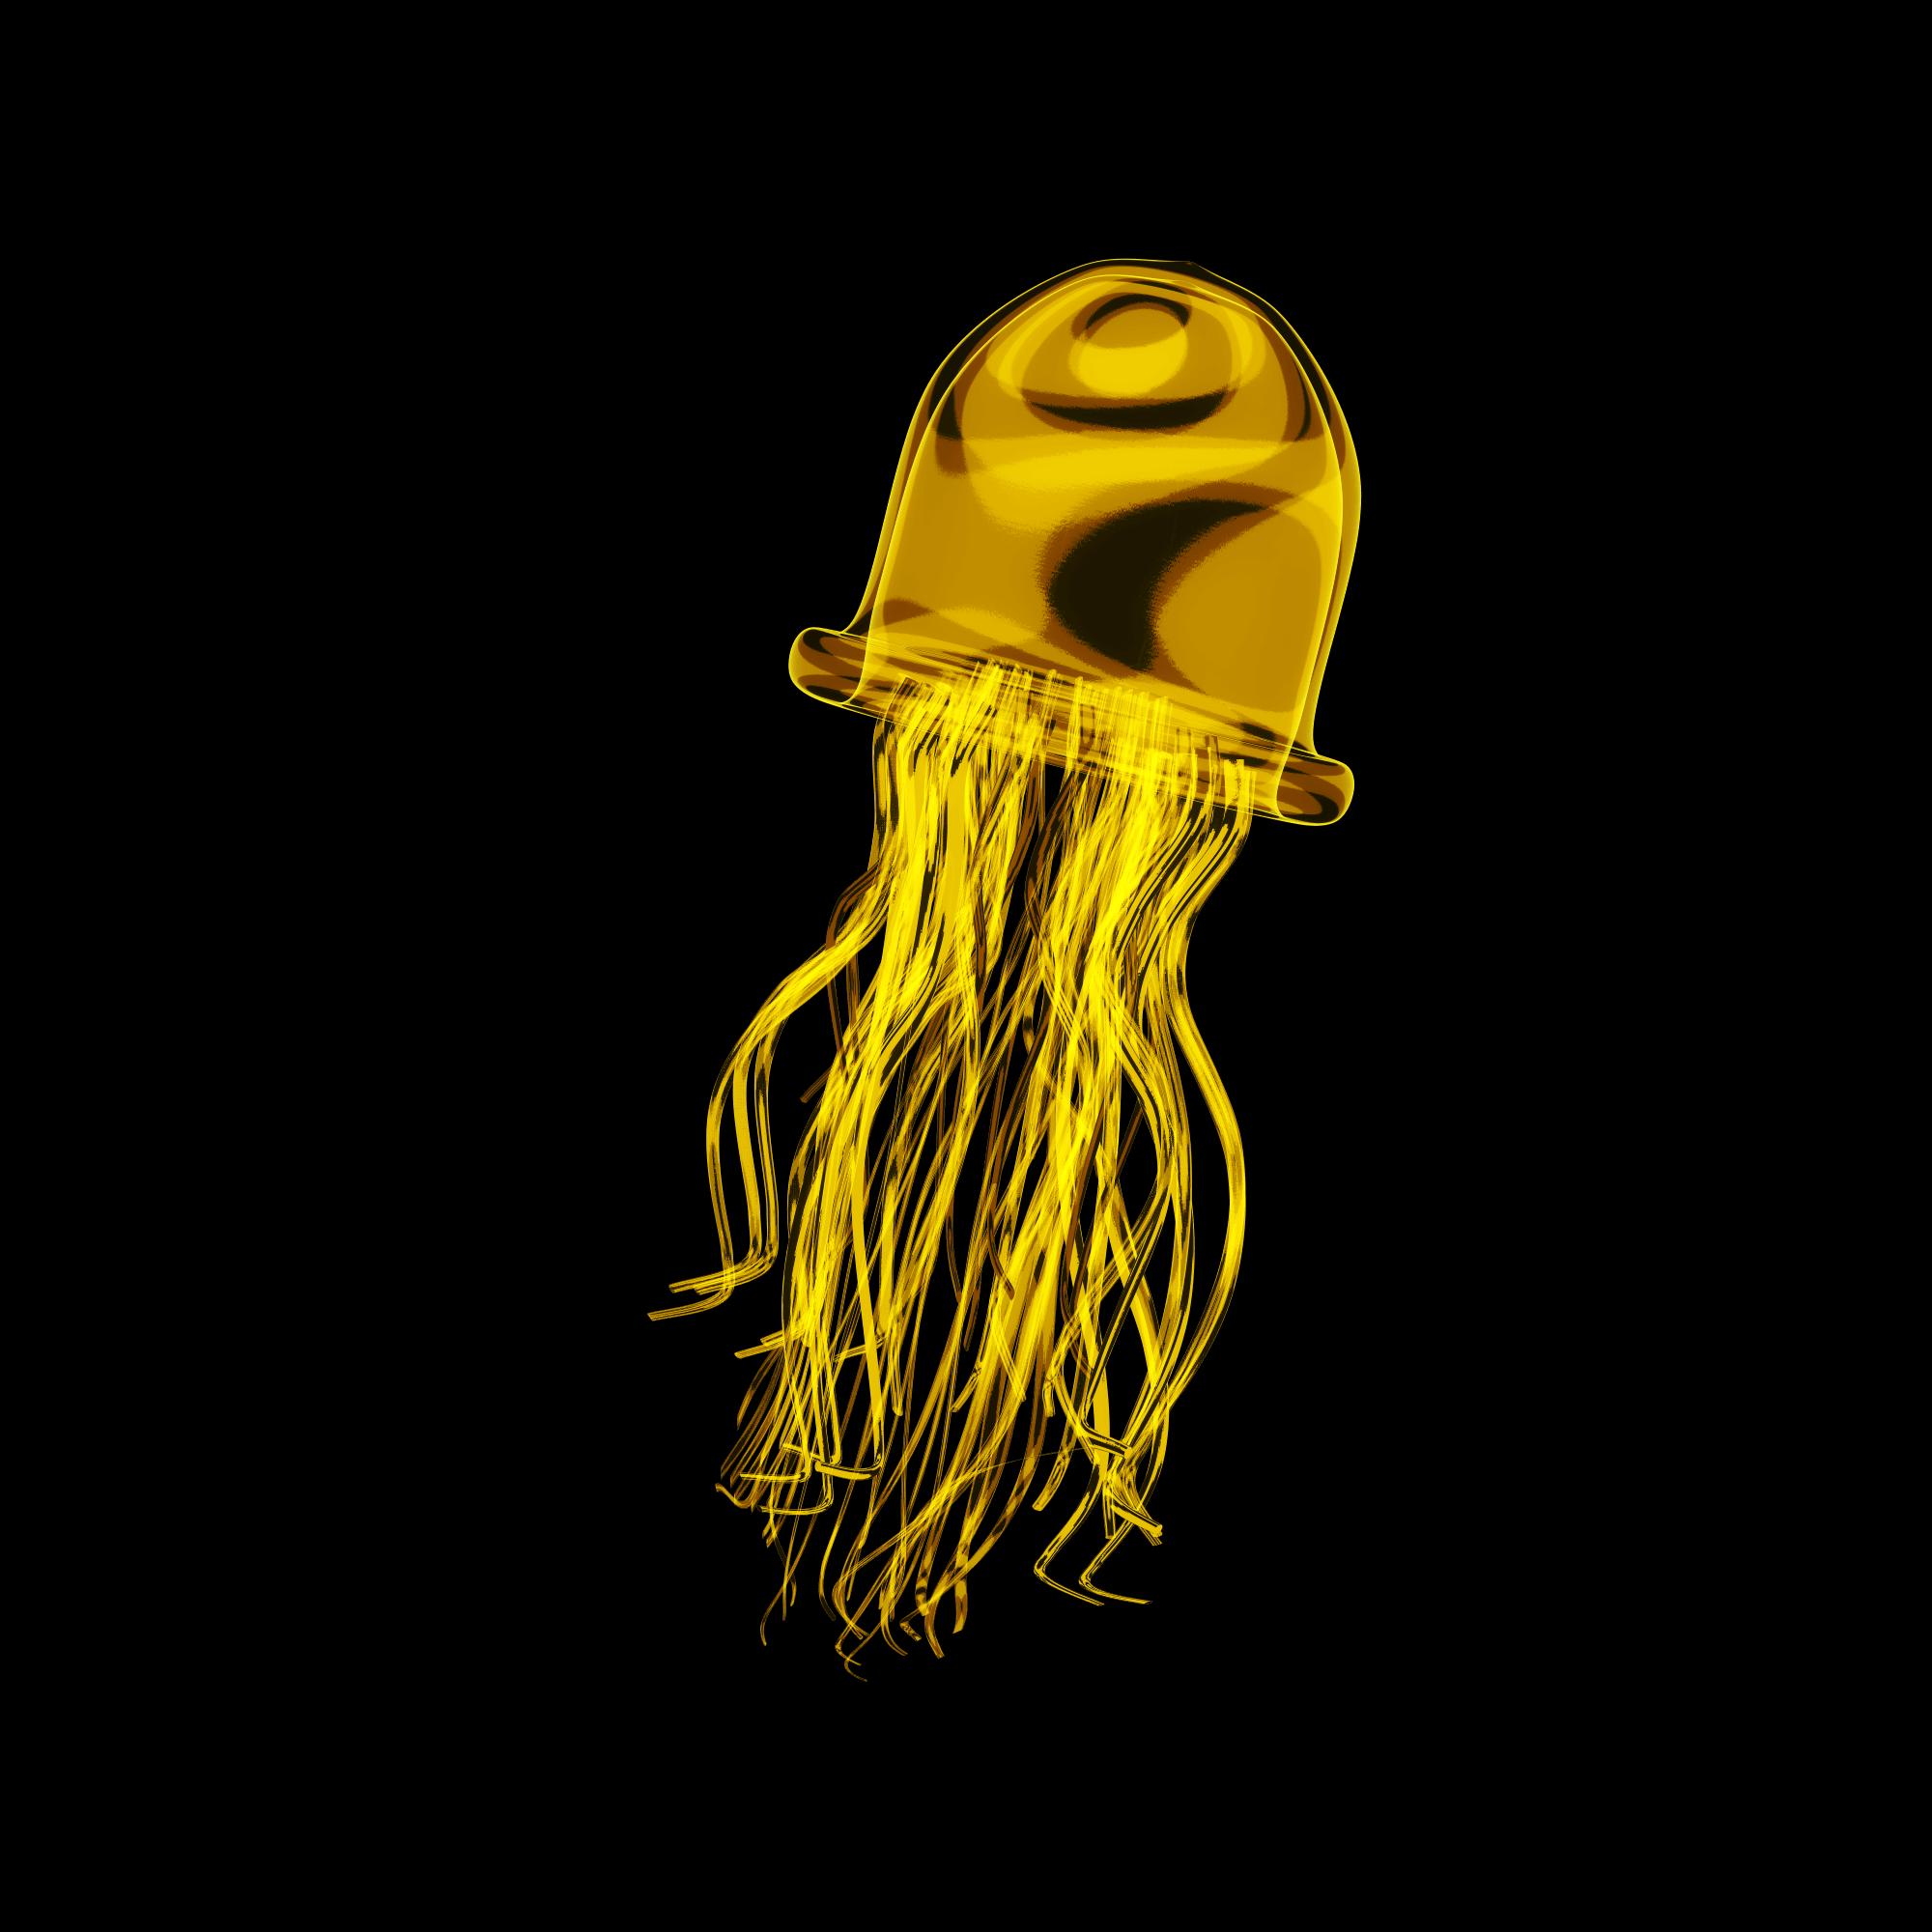 Jellybee, the bee themed jellyfish